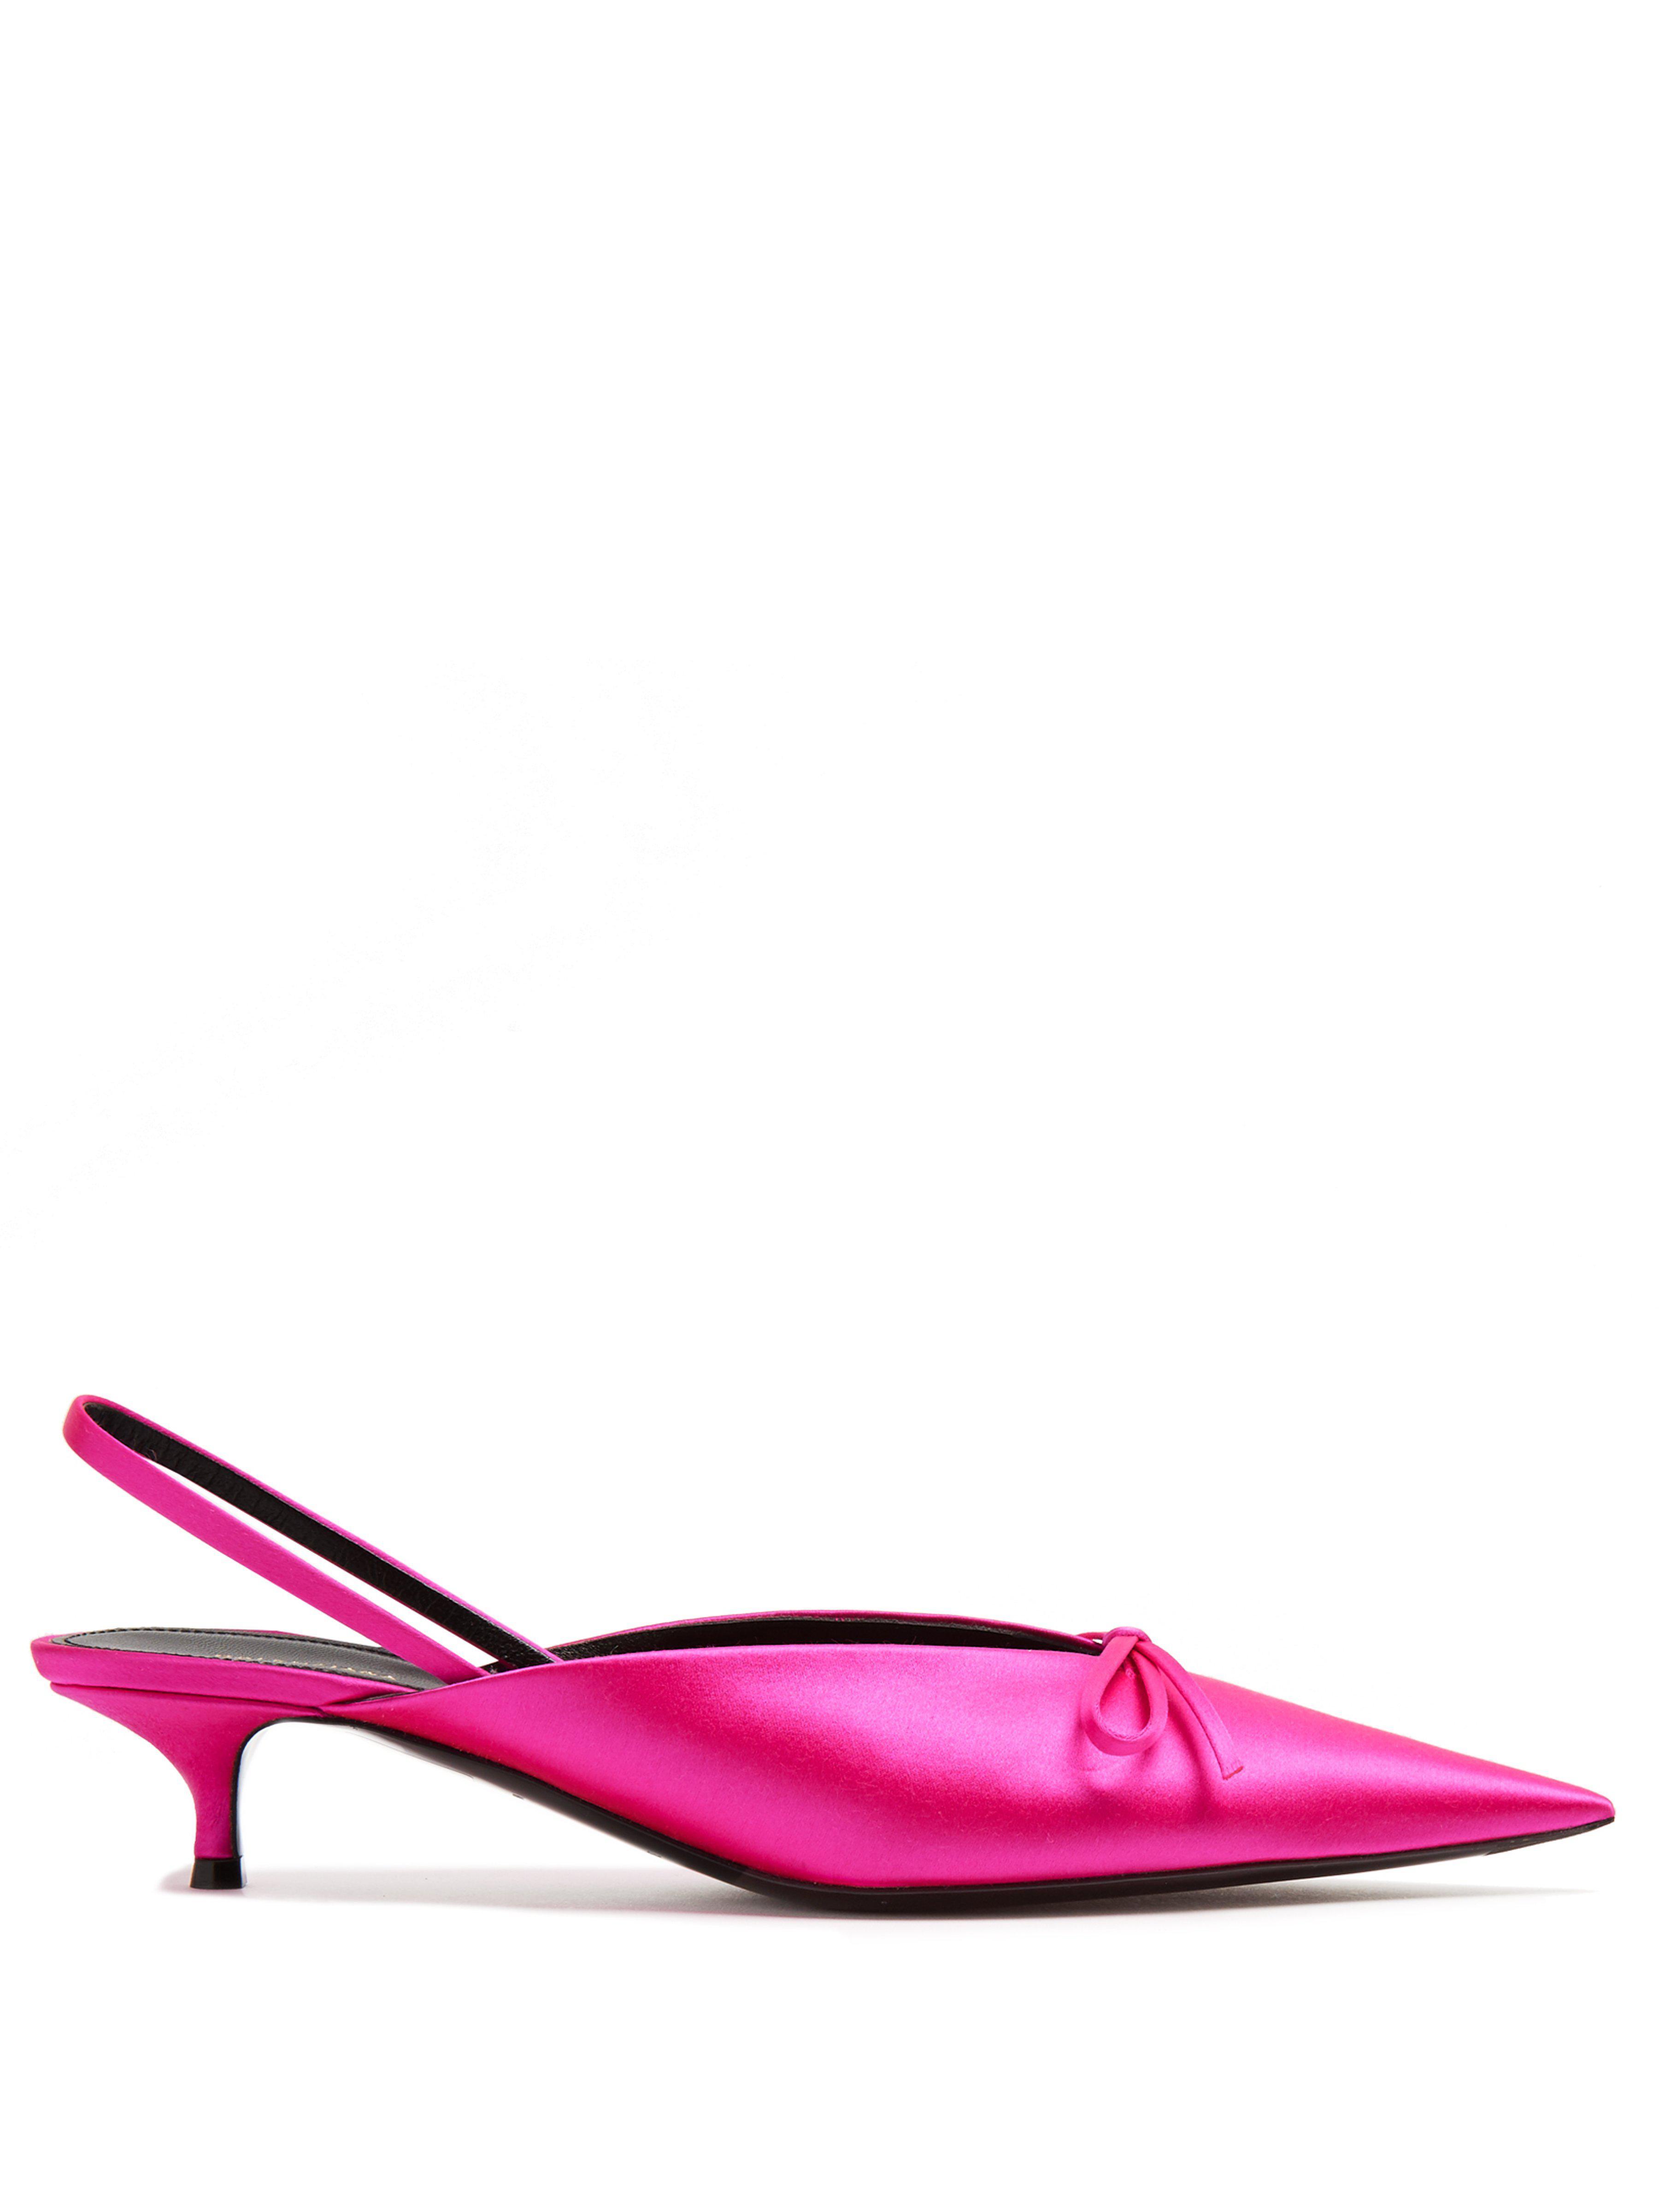 b7eee6ddde6c Balenciaga Knife Slingback Mules in Pink - Lyst